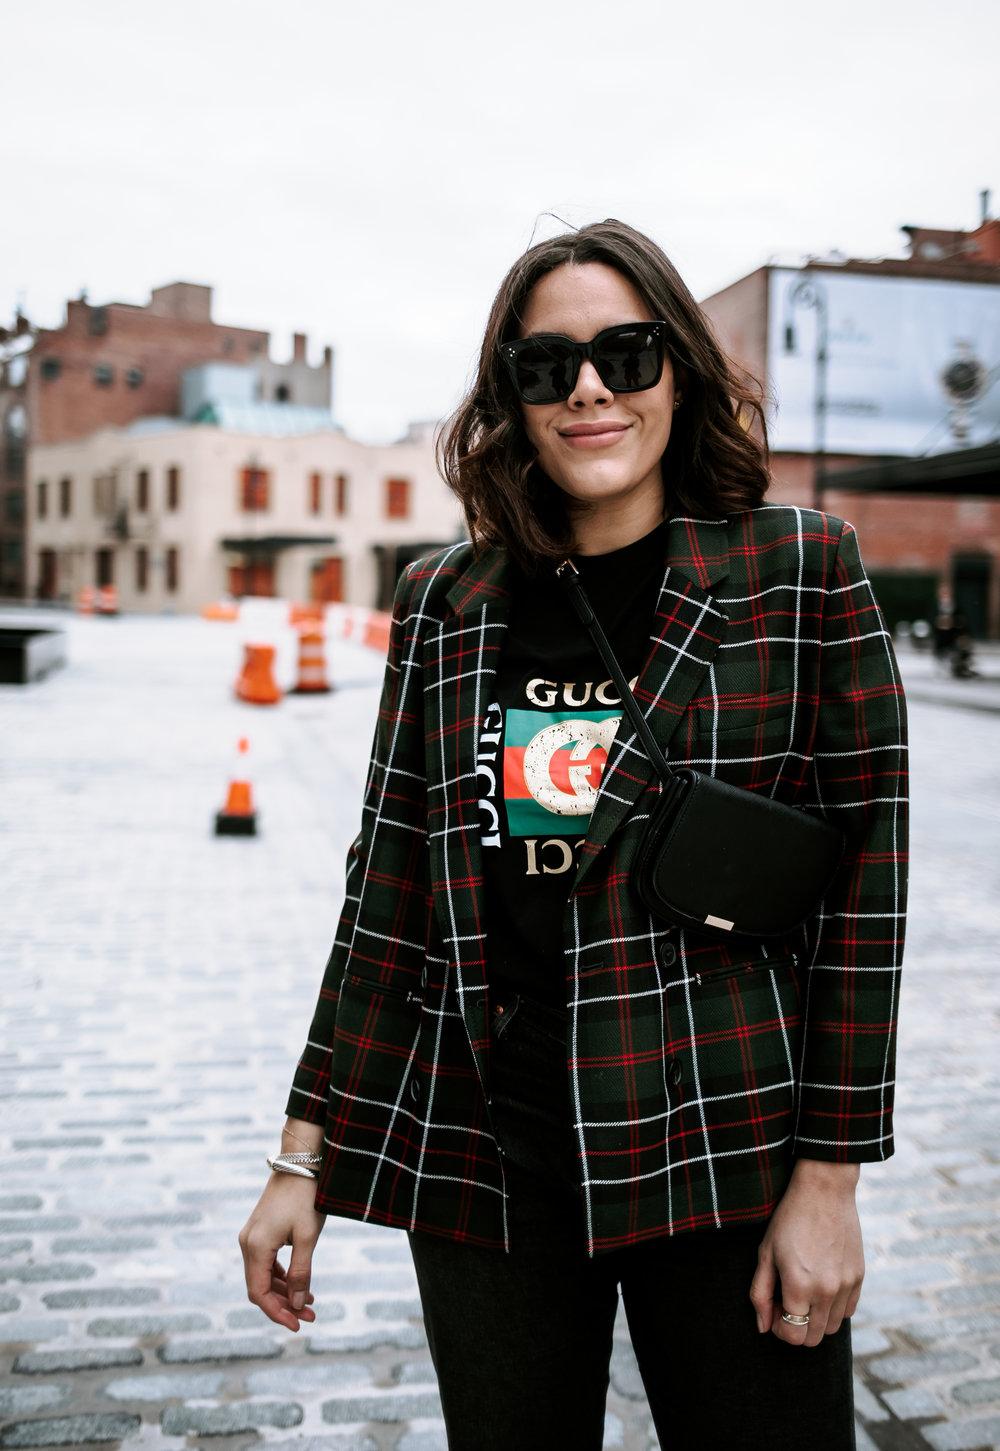 how-to-style-gucci-graphic-tshirt-zara-plaid-blazer-latina-new-york-city-fashion-blogger-style-operator-winter-fashion.jpg